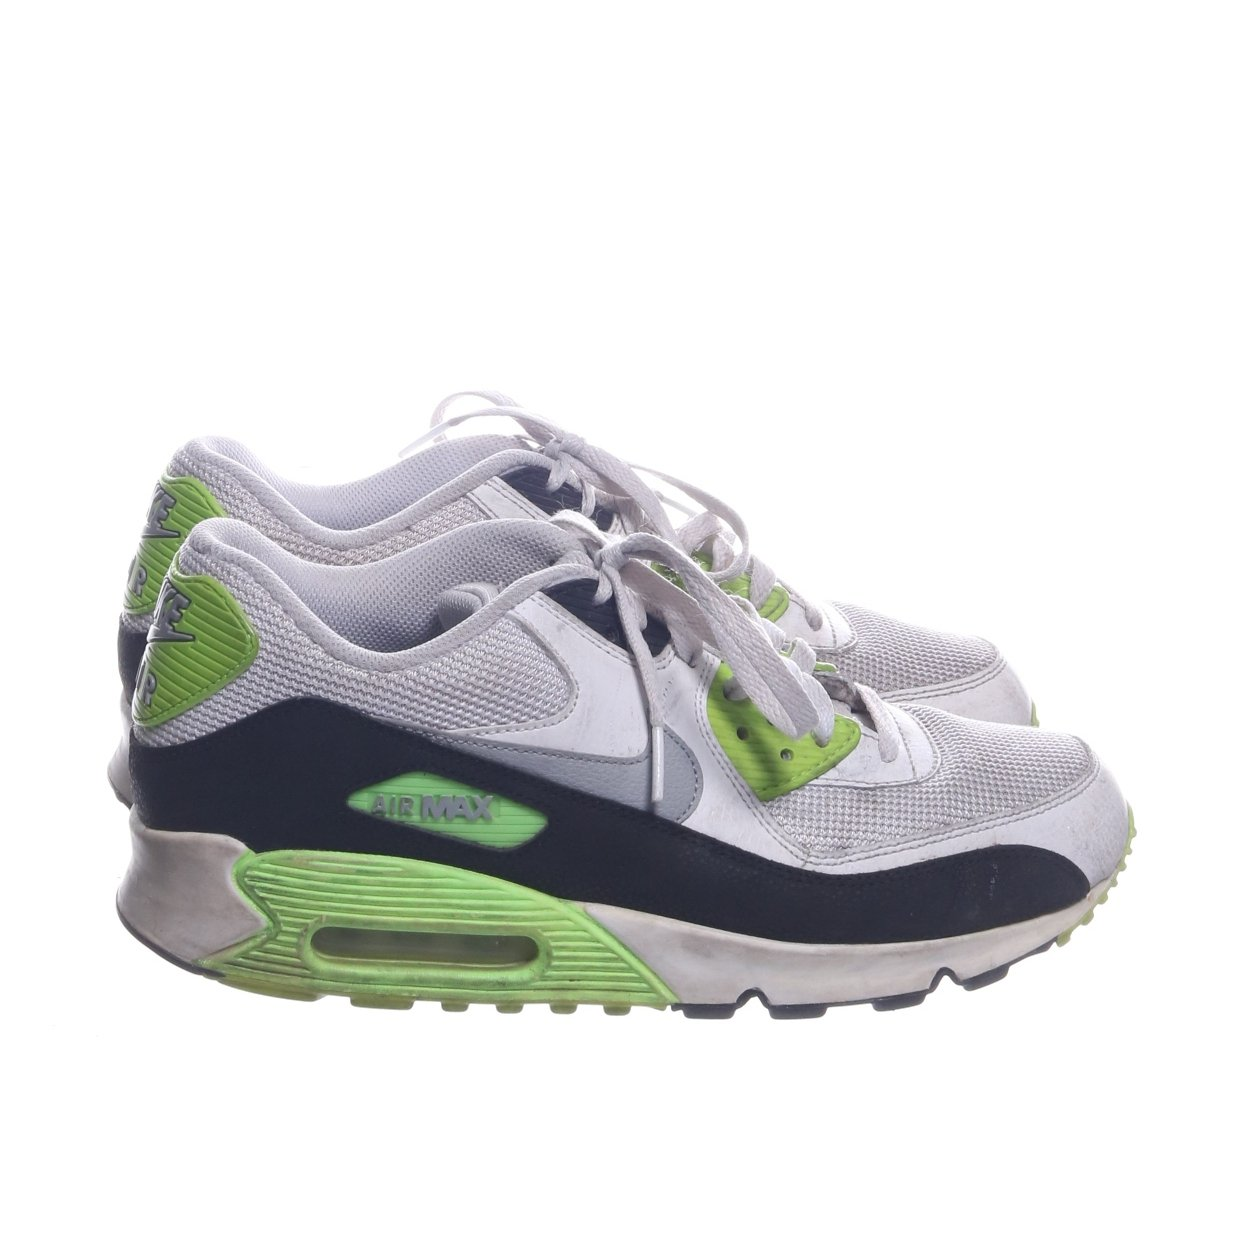 the best attitude 03e57 3640f Nike, Sneakers, Strl  43, nike air , Svart Vit Grön